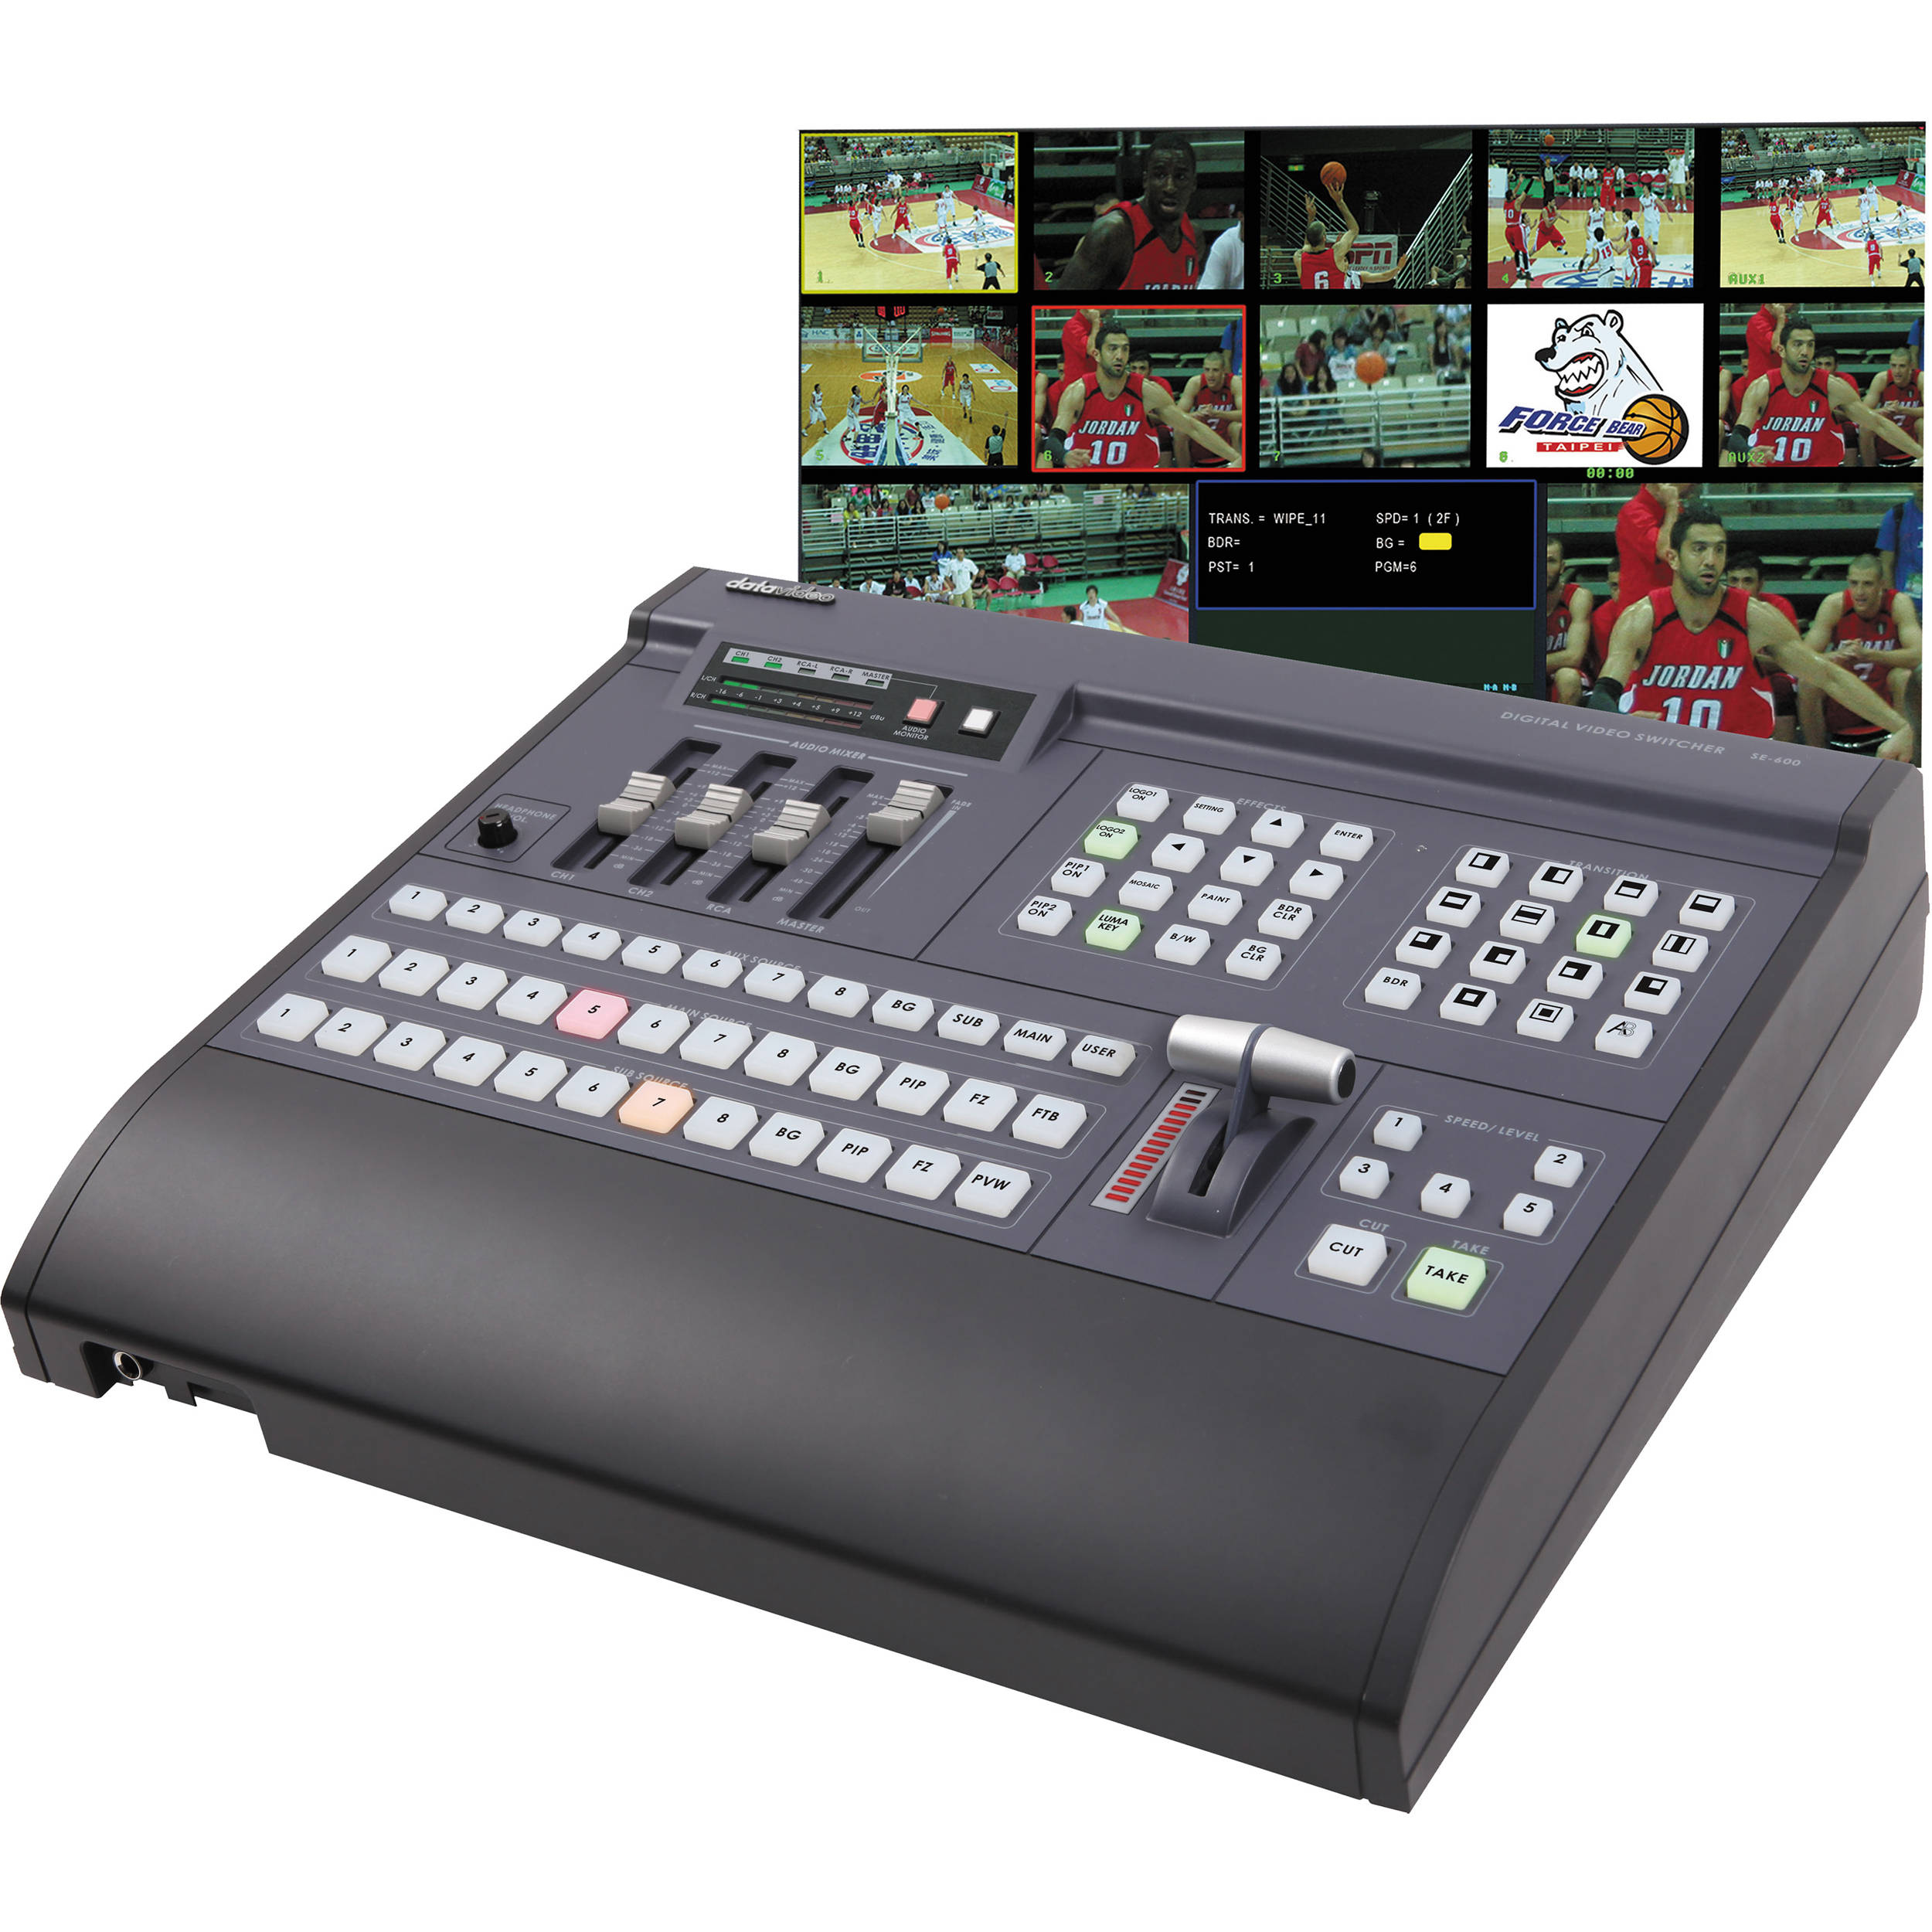 Datavideo Se 600 8 Input A V Switcher With Cv Dvi D Se600 Road Gear 1 Amplifier Head Cabinet Hitam